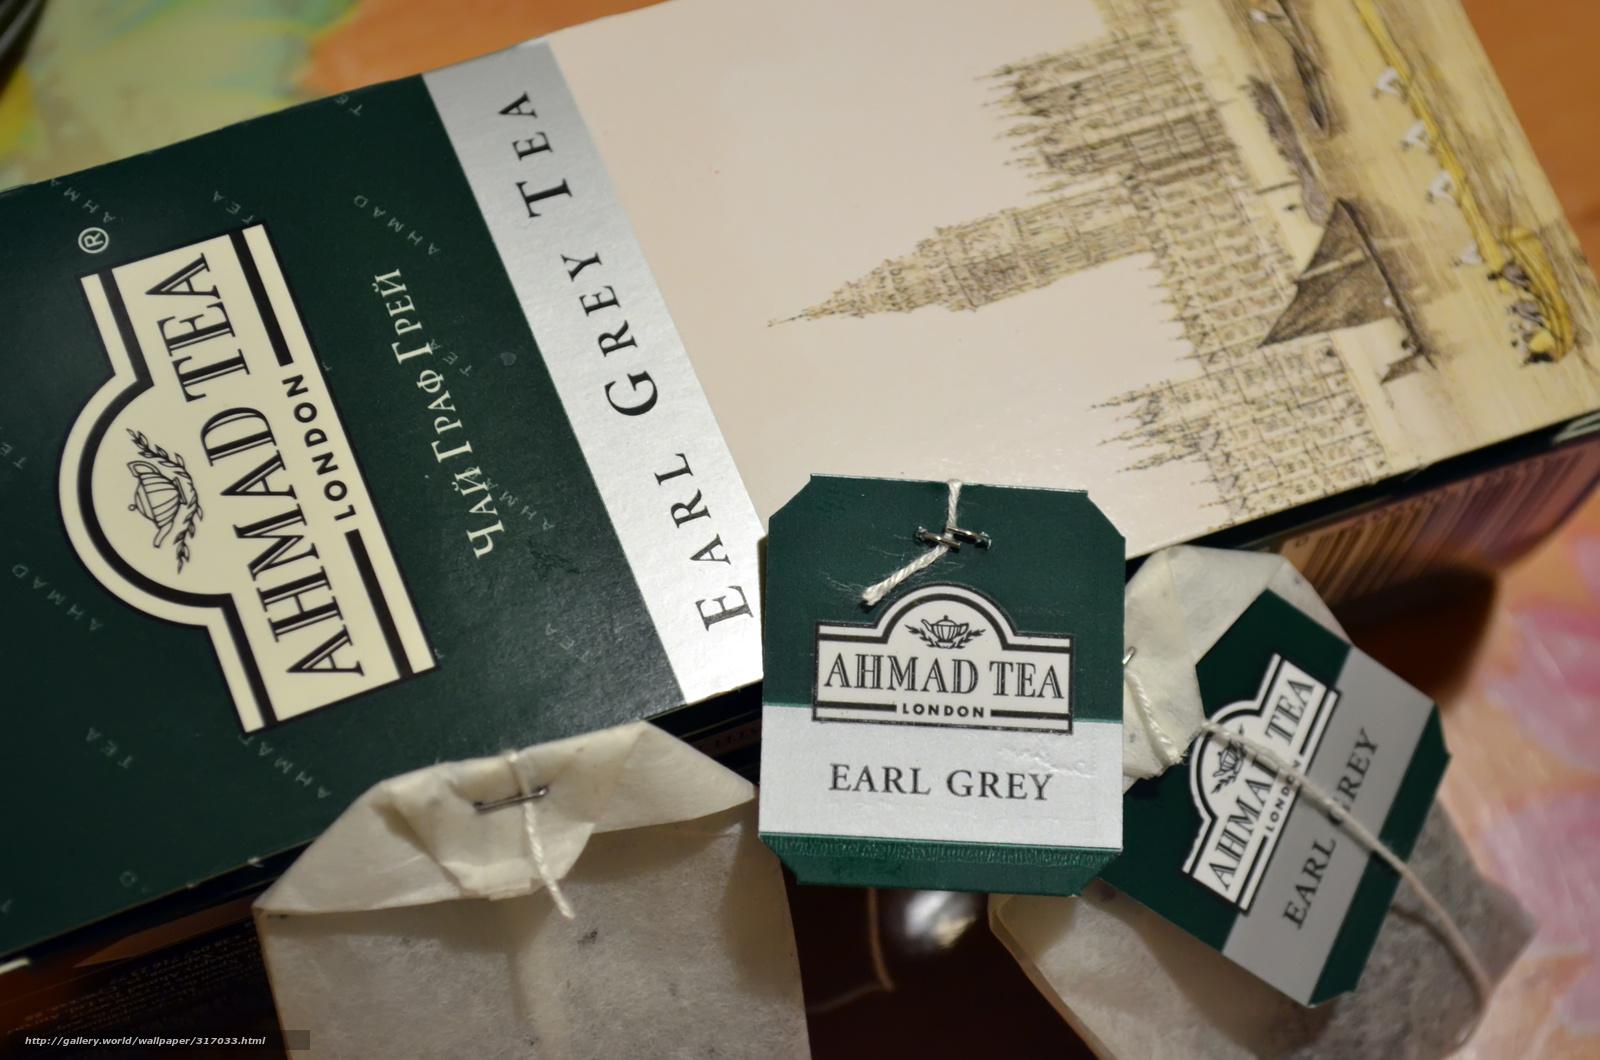 Download wallpaper Ahmad,  tea,  garbage free desktop wallpaper in the resolution 4928x3264 — picture №317033